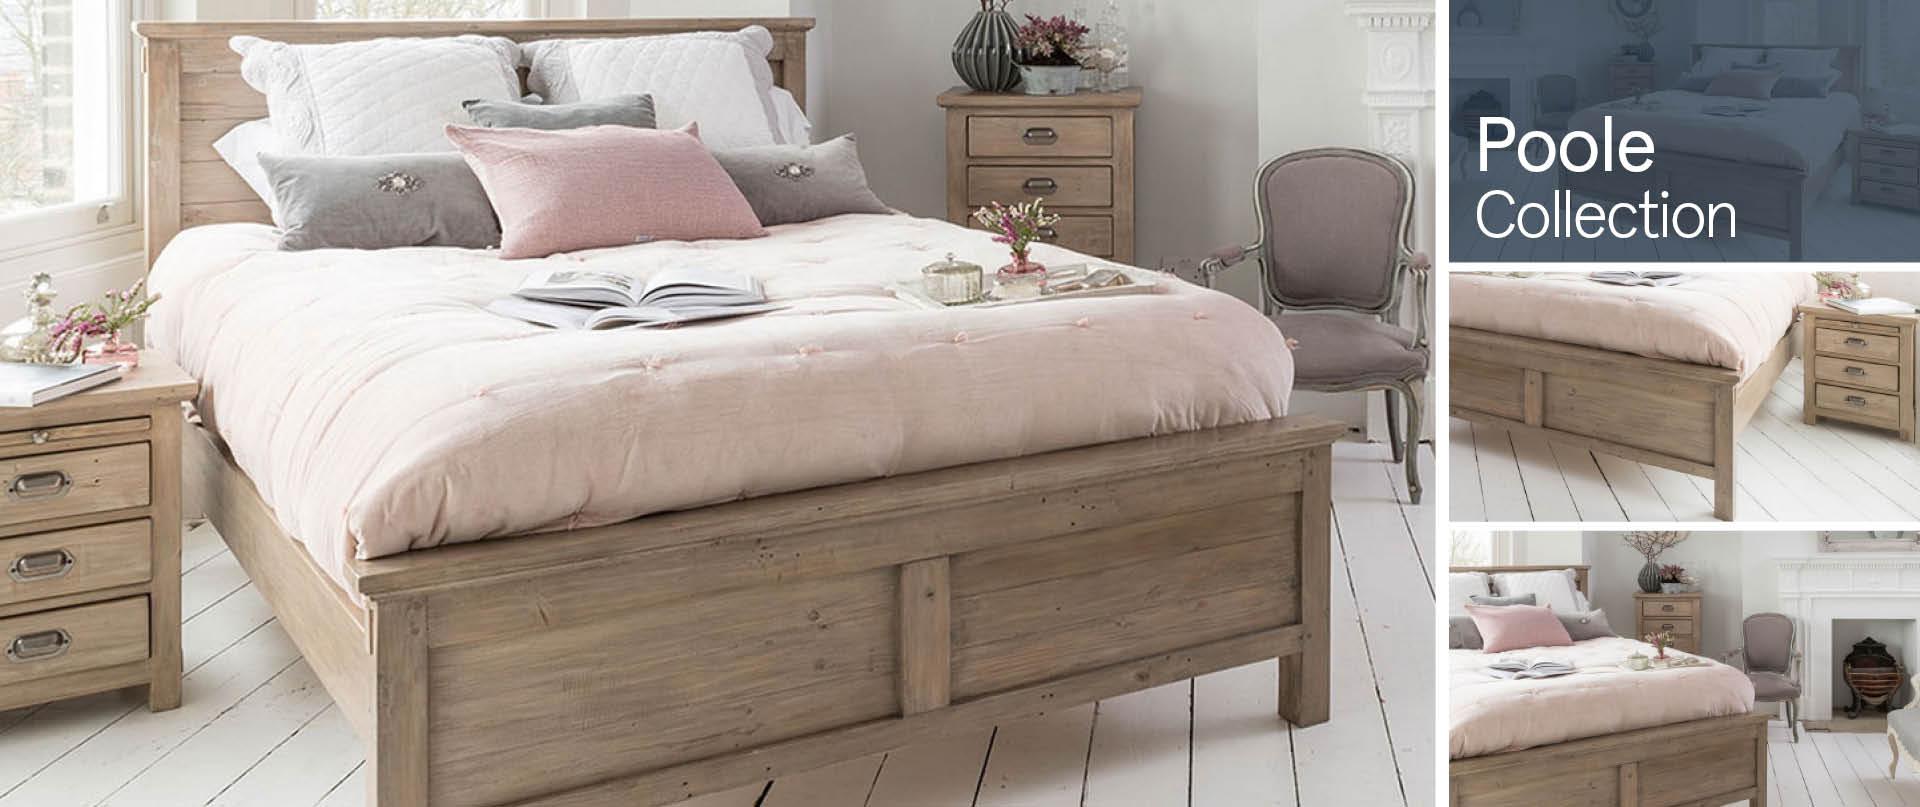 Poole Bedroom Furniture Ranges